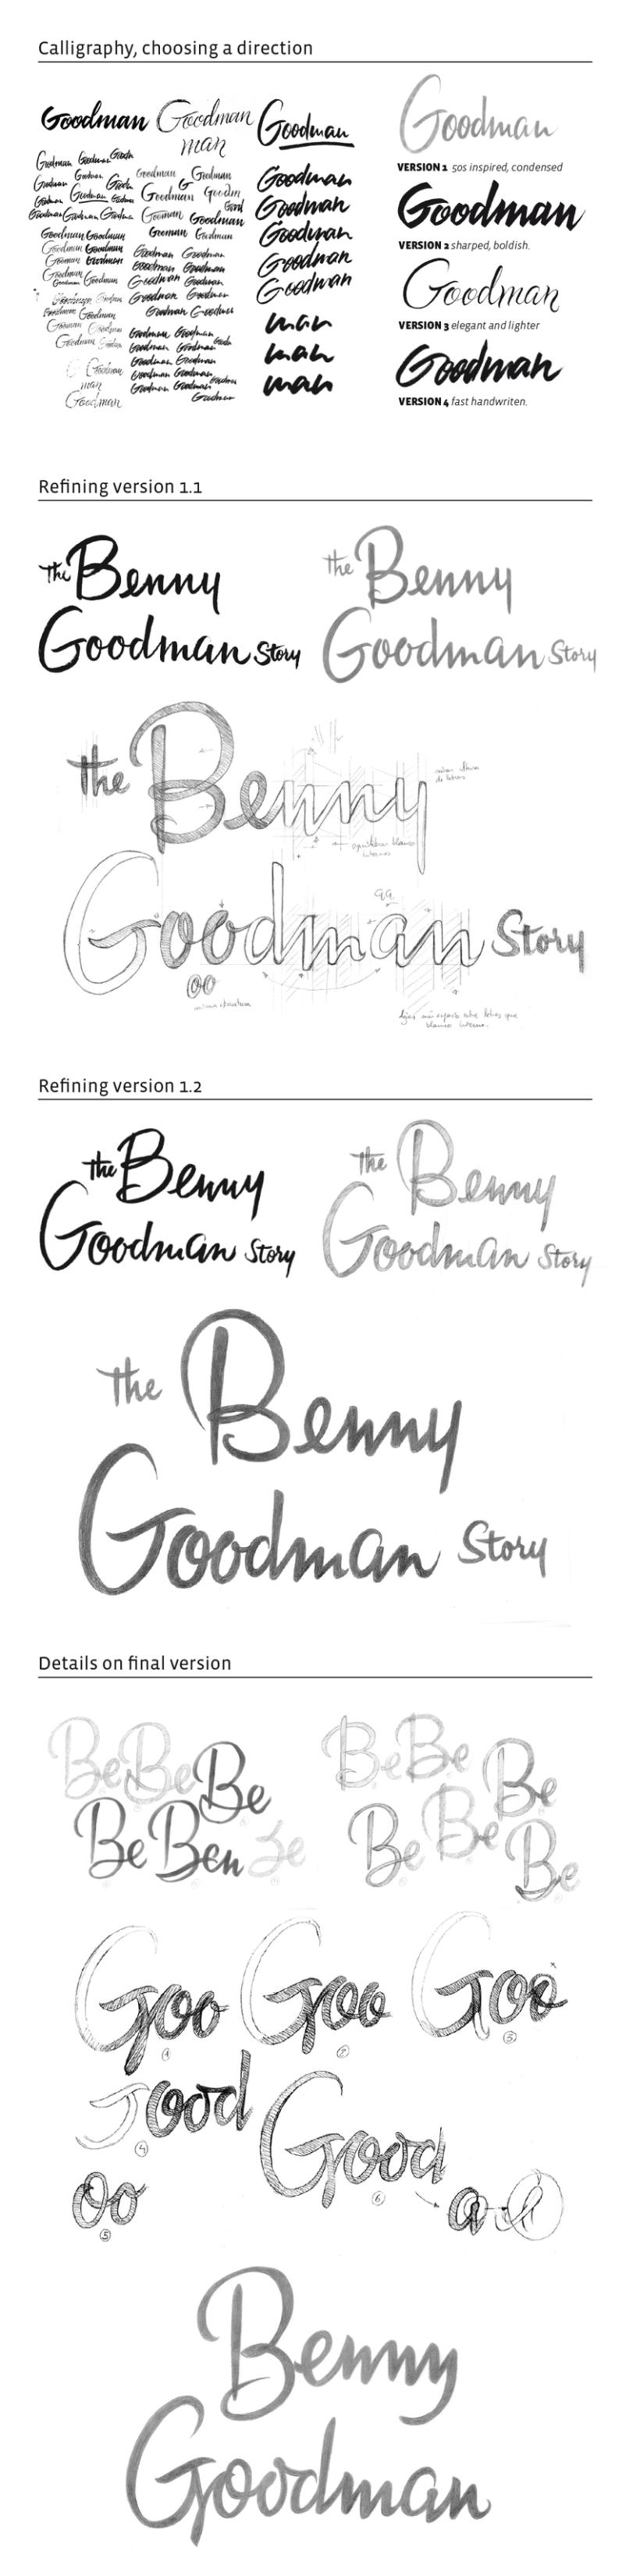 The Benny Goodman Story 2